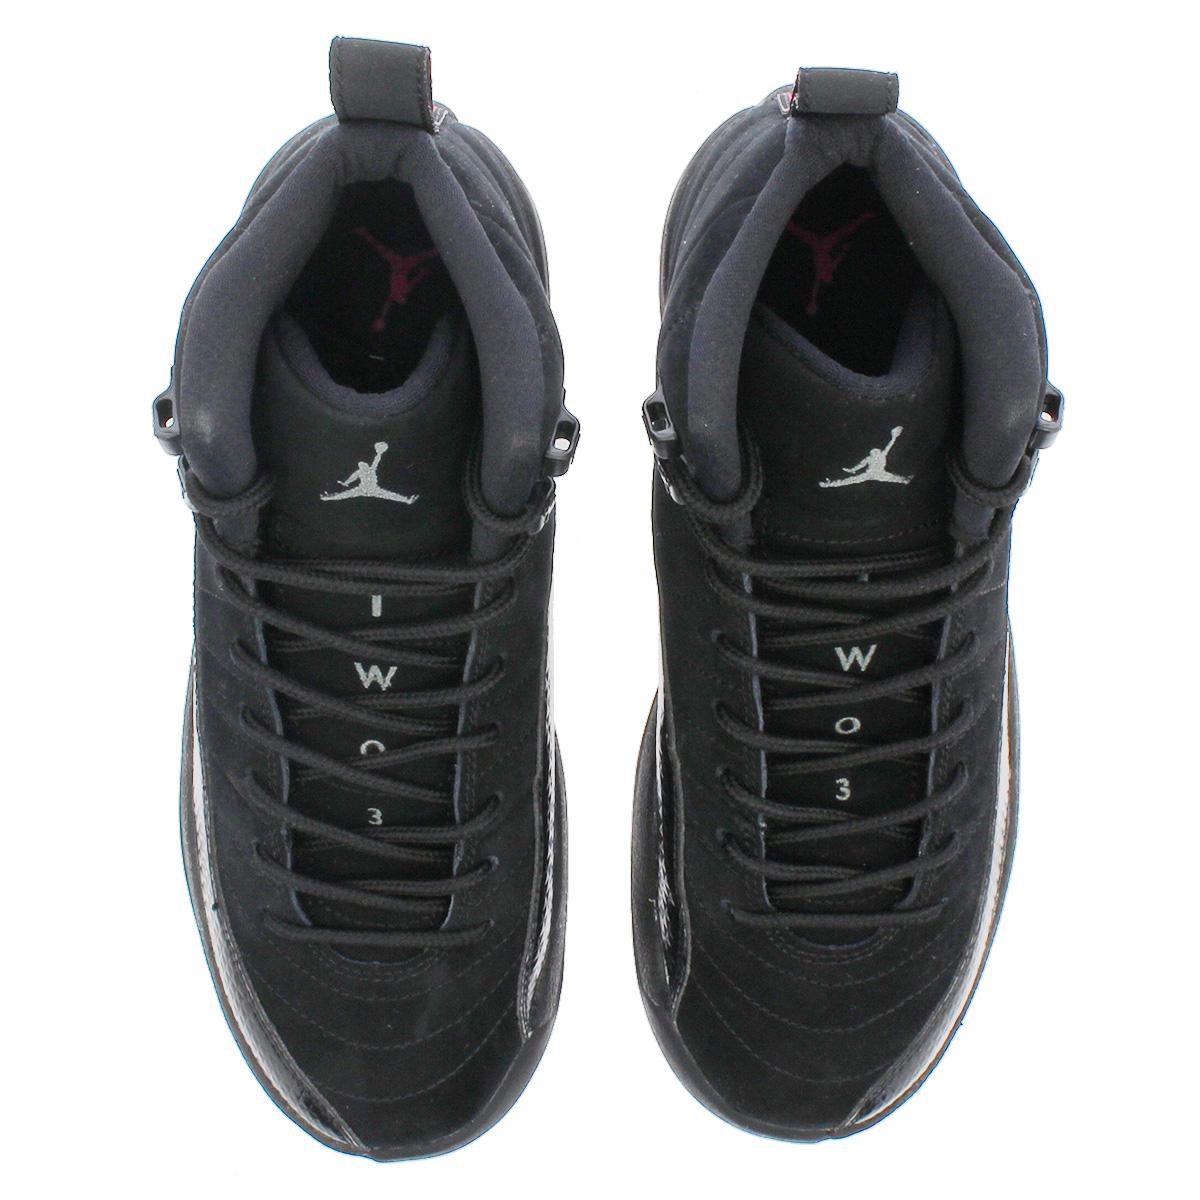 7b2d999a5b05 NIKE AIR JORDAN 12 RETRO GG Nike Air Jordan 12 nostalgic GG BLACK DARK  GREY RUSH PINK 510